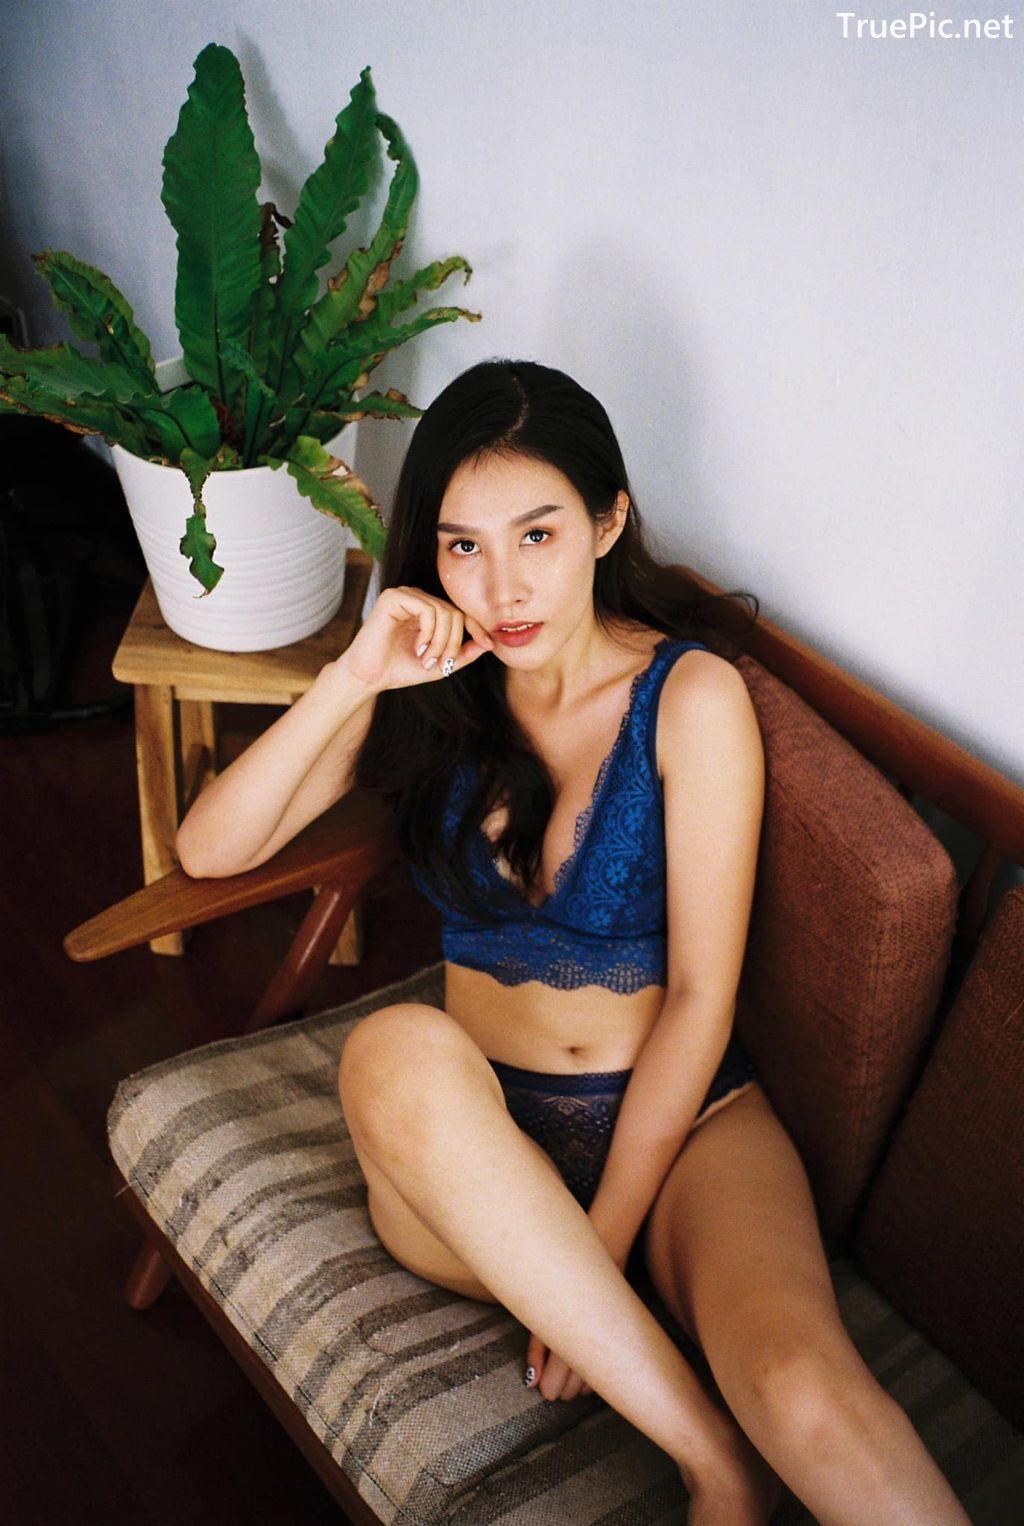 Image-Thailand-Model-Ssomch-Tanass-Blue-Lingerie-TruePic.net-TruePic.net- Picture-5